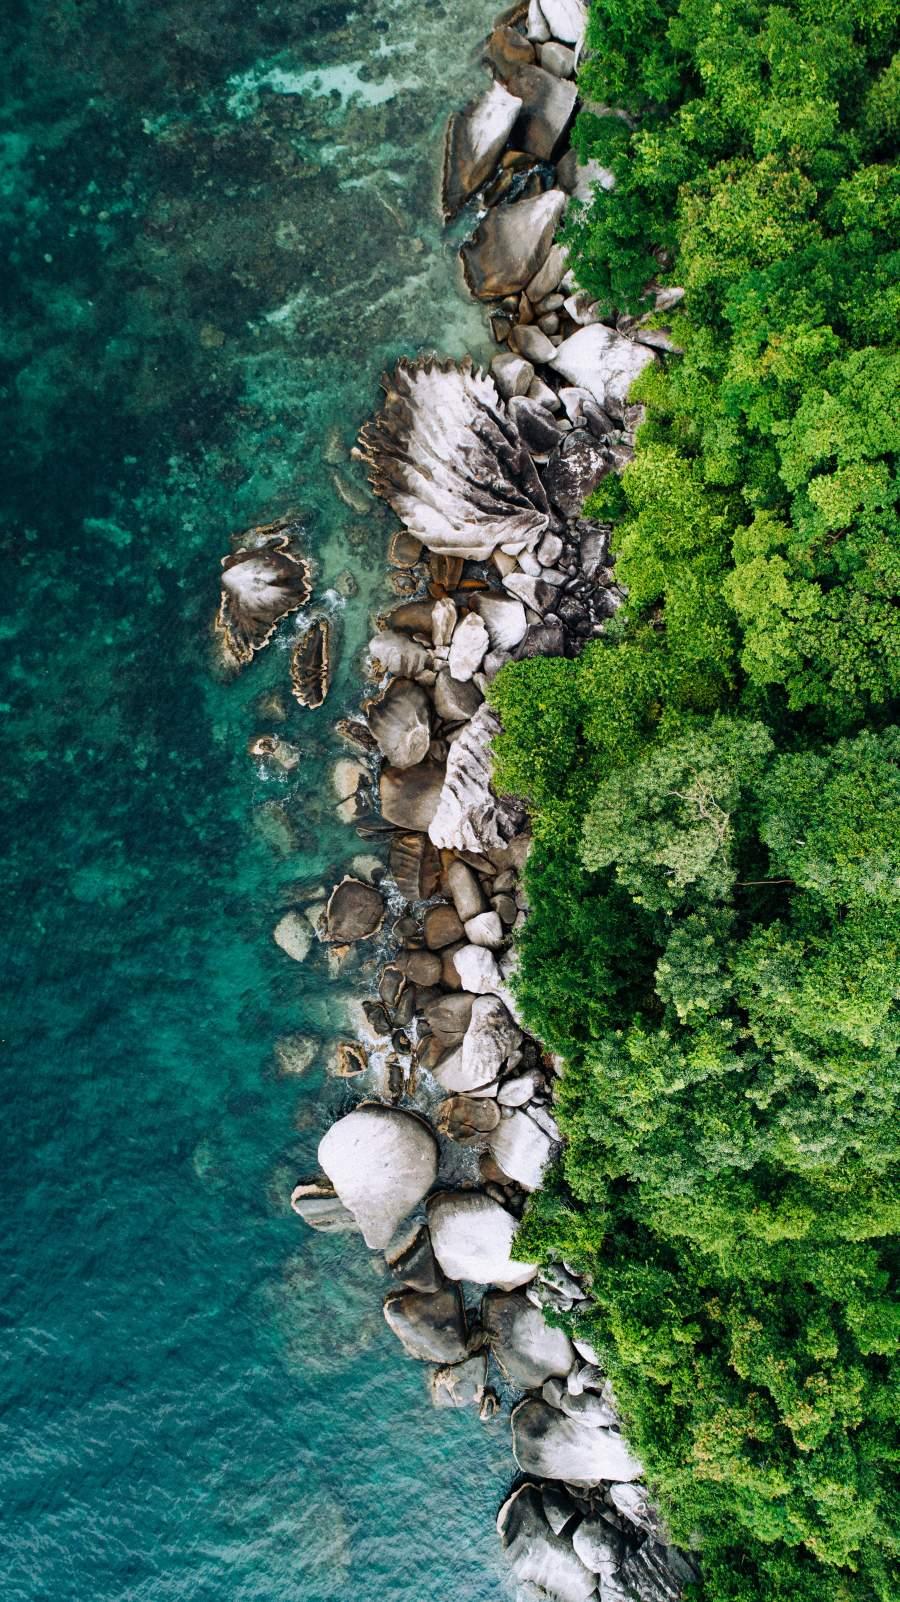 Aerial View Water Stones Nature iPhone Wallpaper